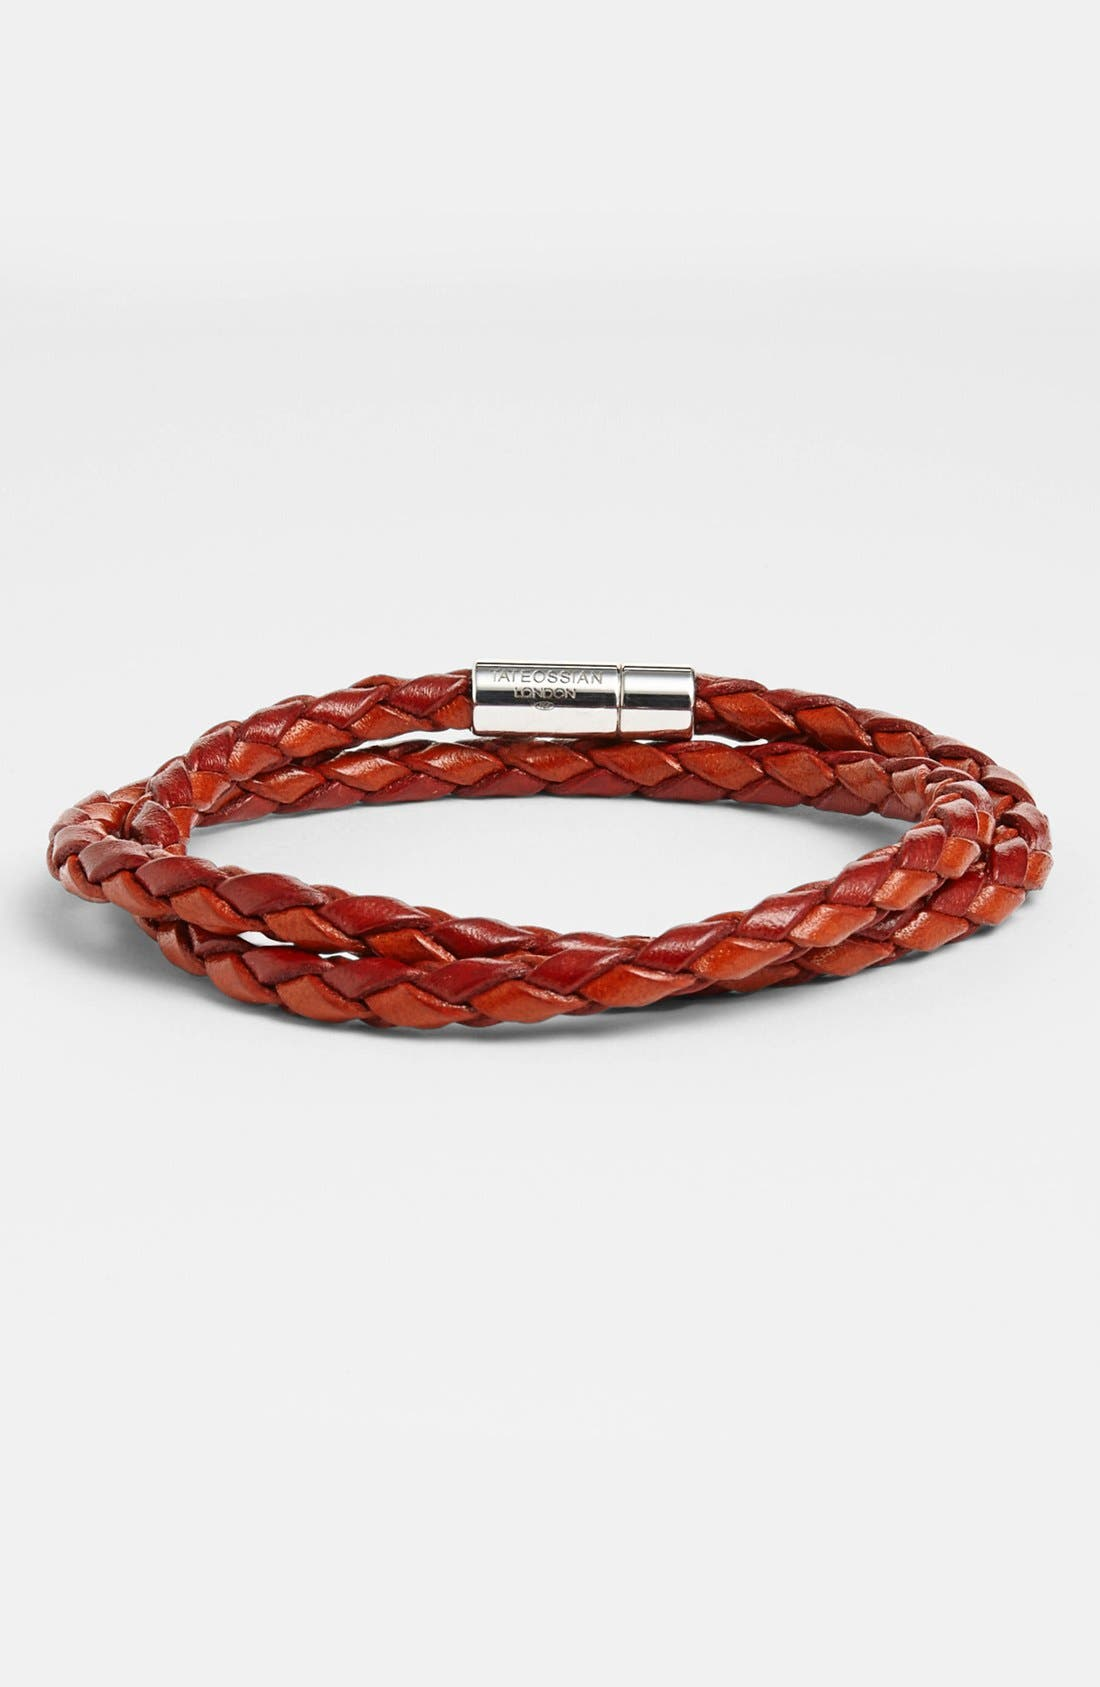 Main Image - Tateossian 'Pop' Leather Bracelet